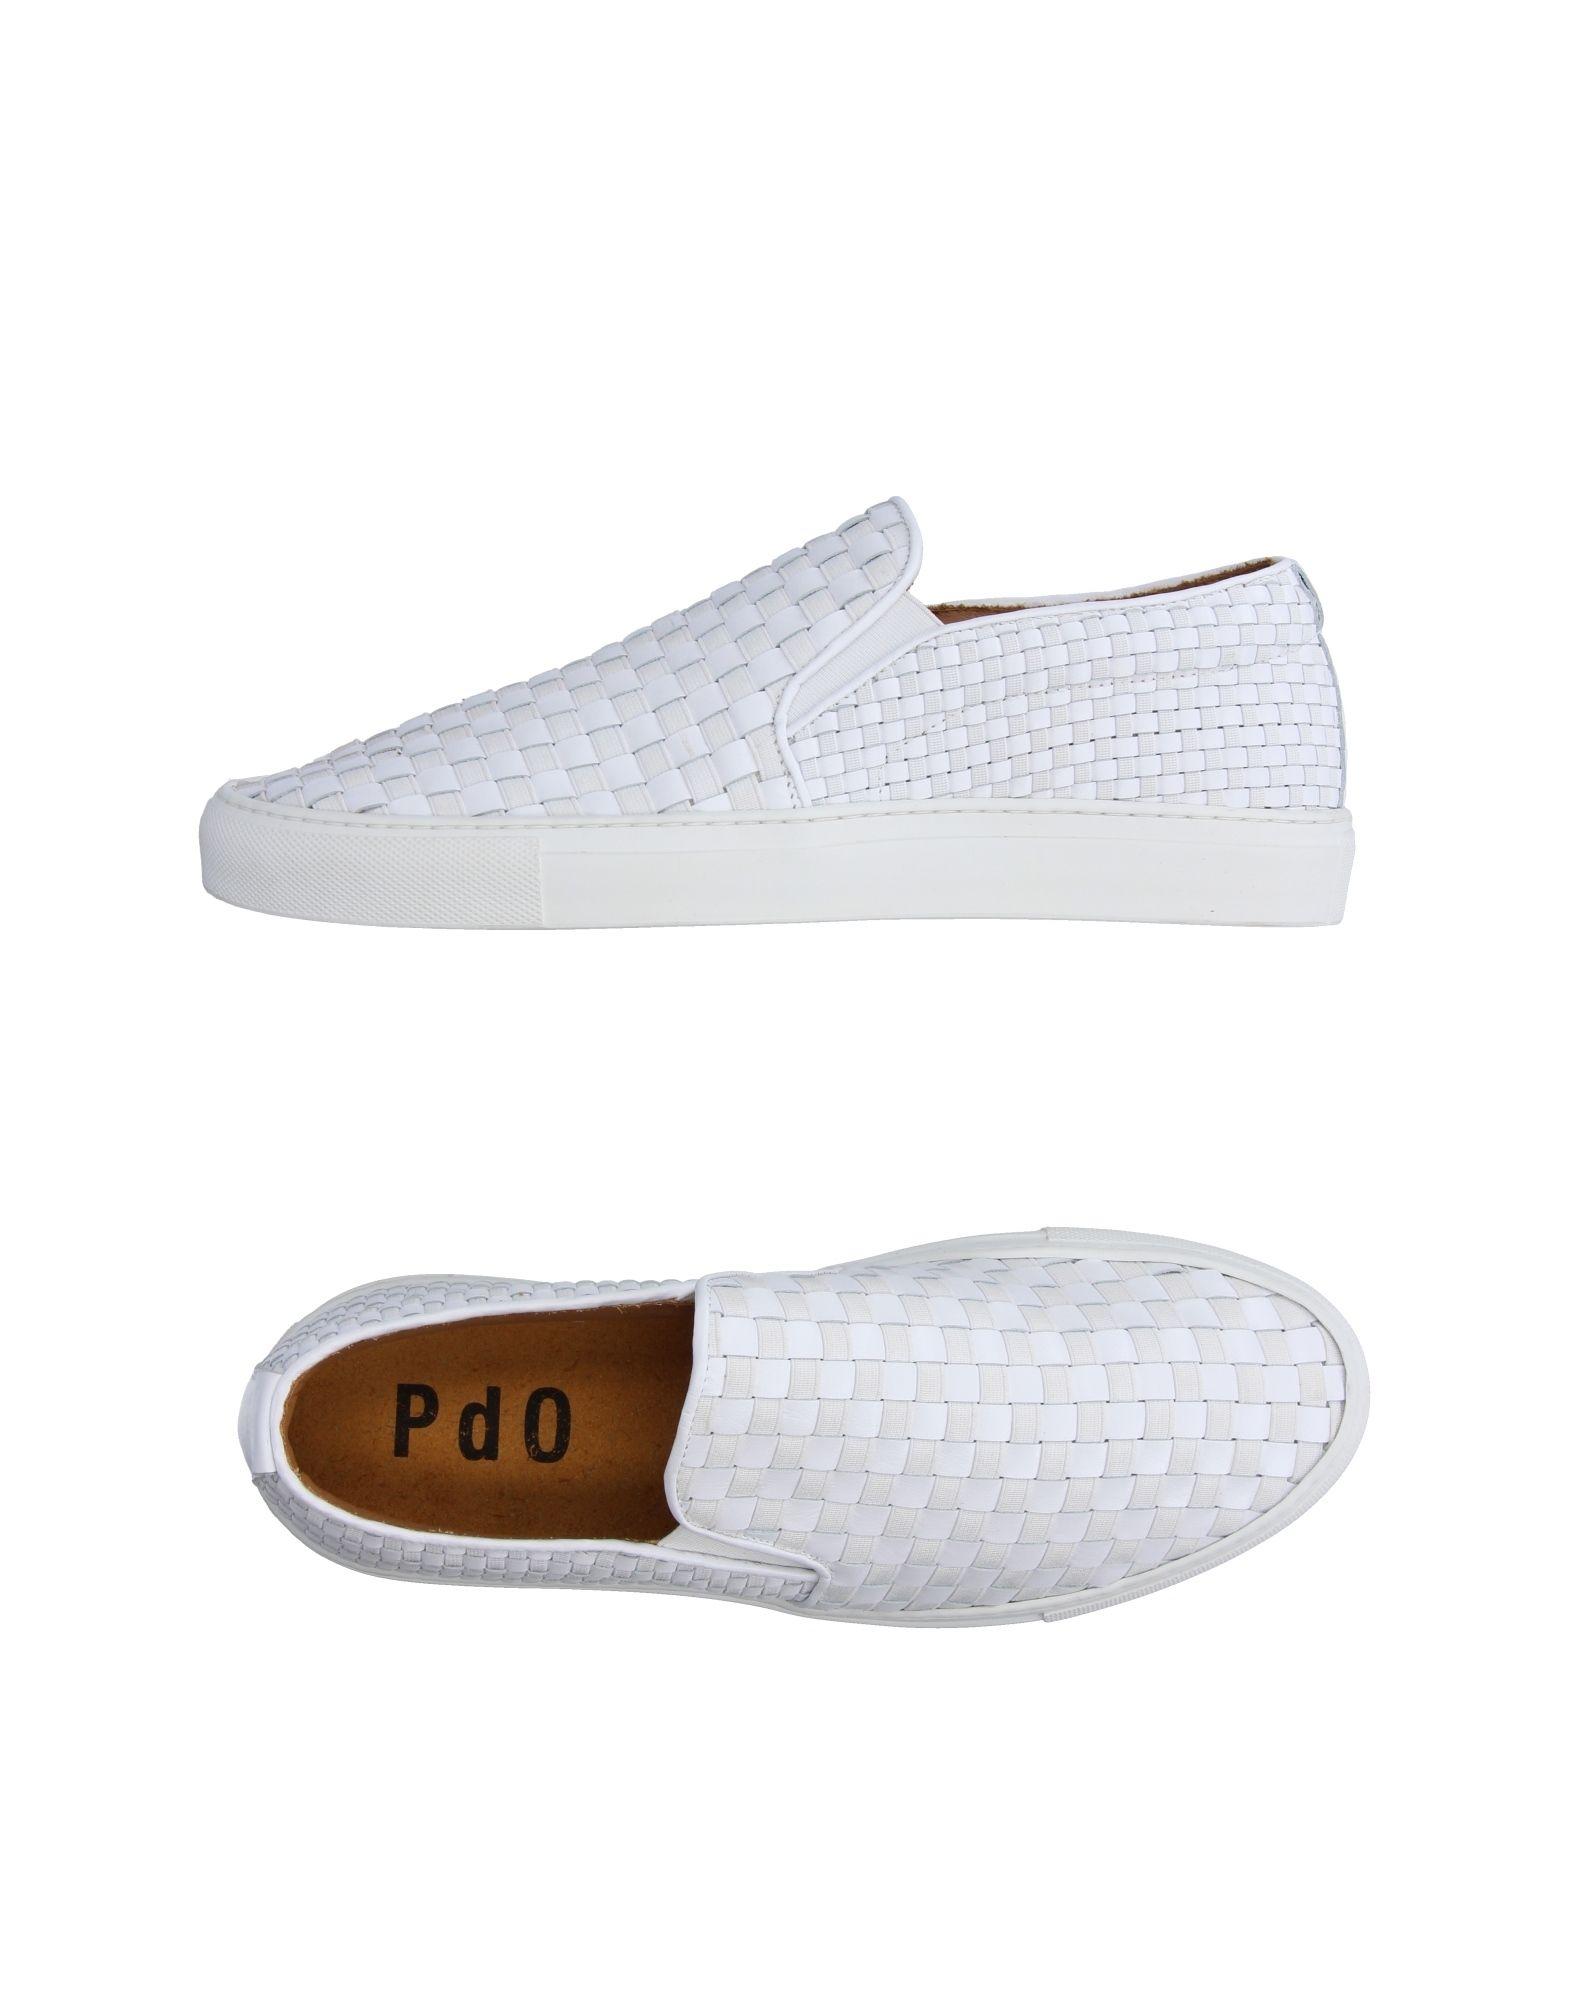 Pantofola D'oro Sneakers Qualität Herren  11221830HK Gute Qualität Sneakers beliebte Schuhe 834b82